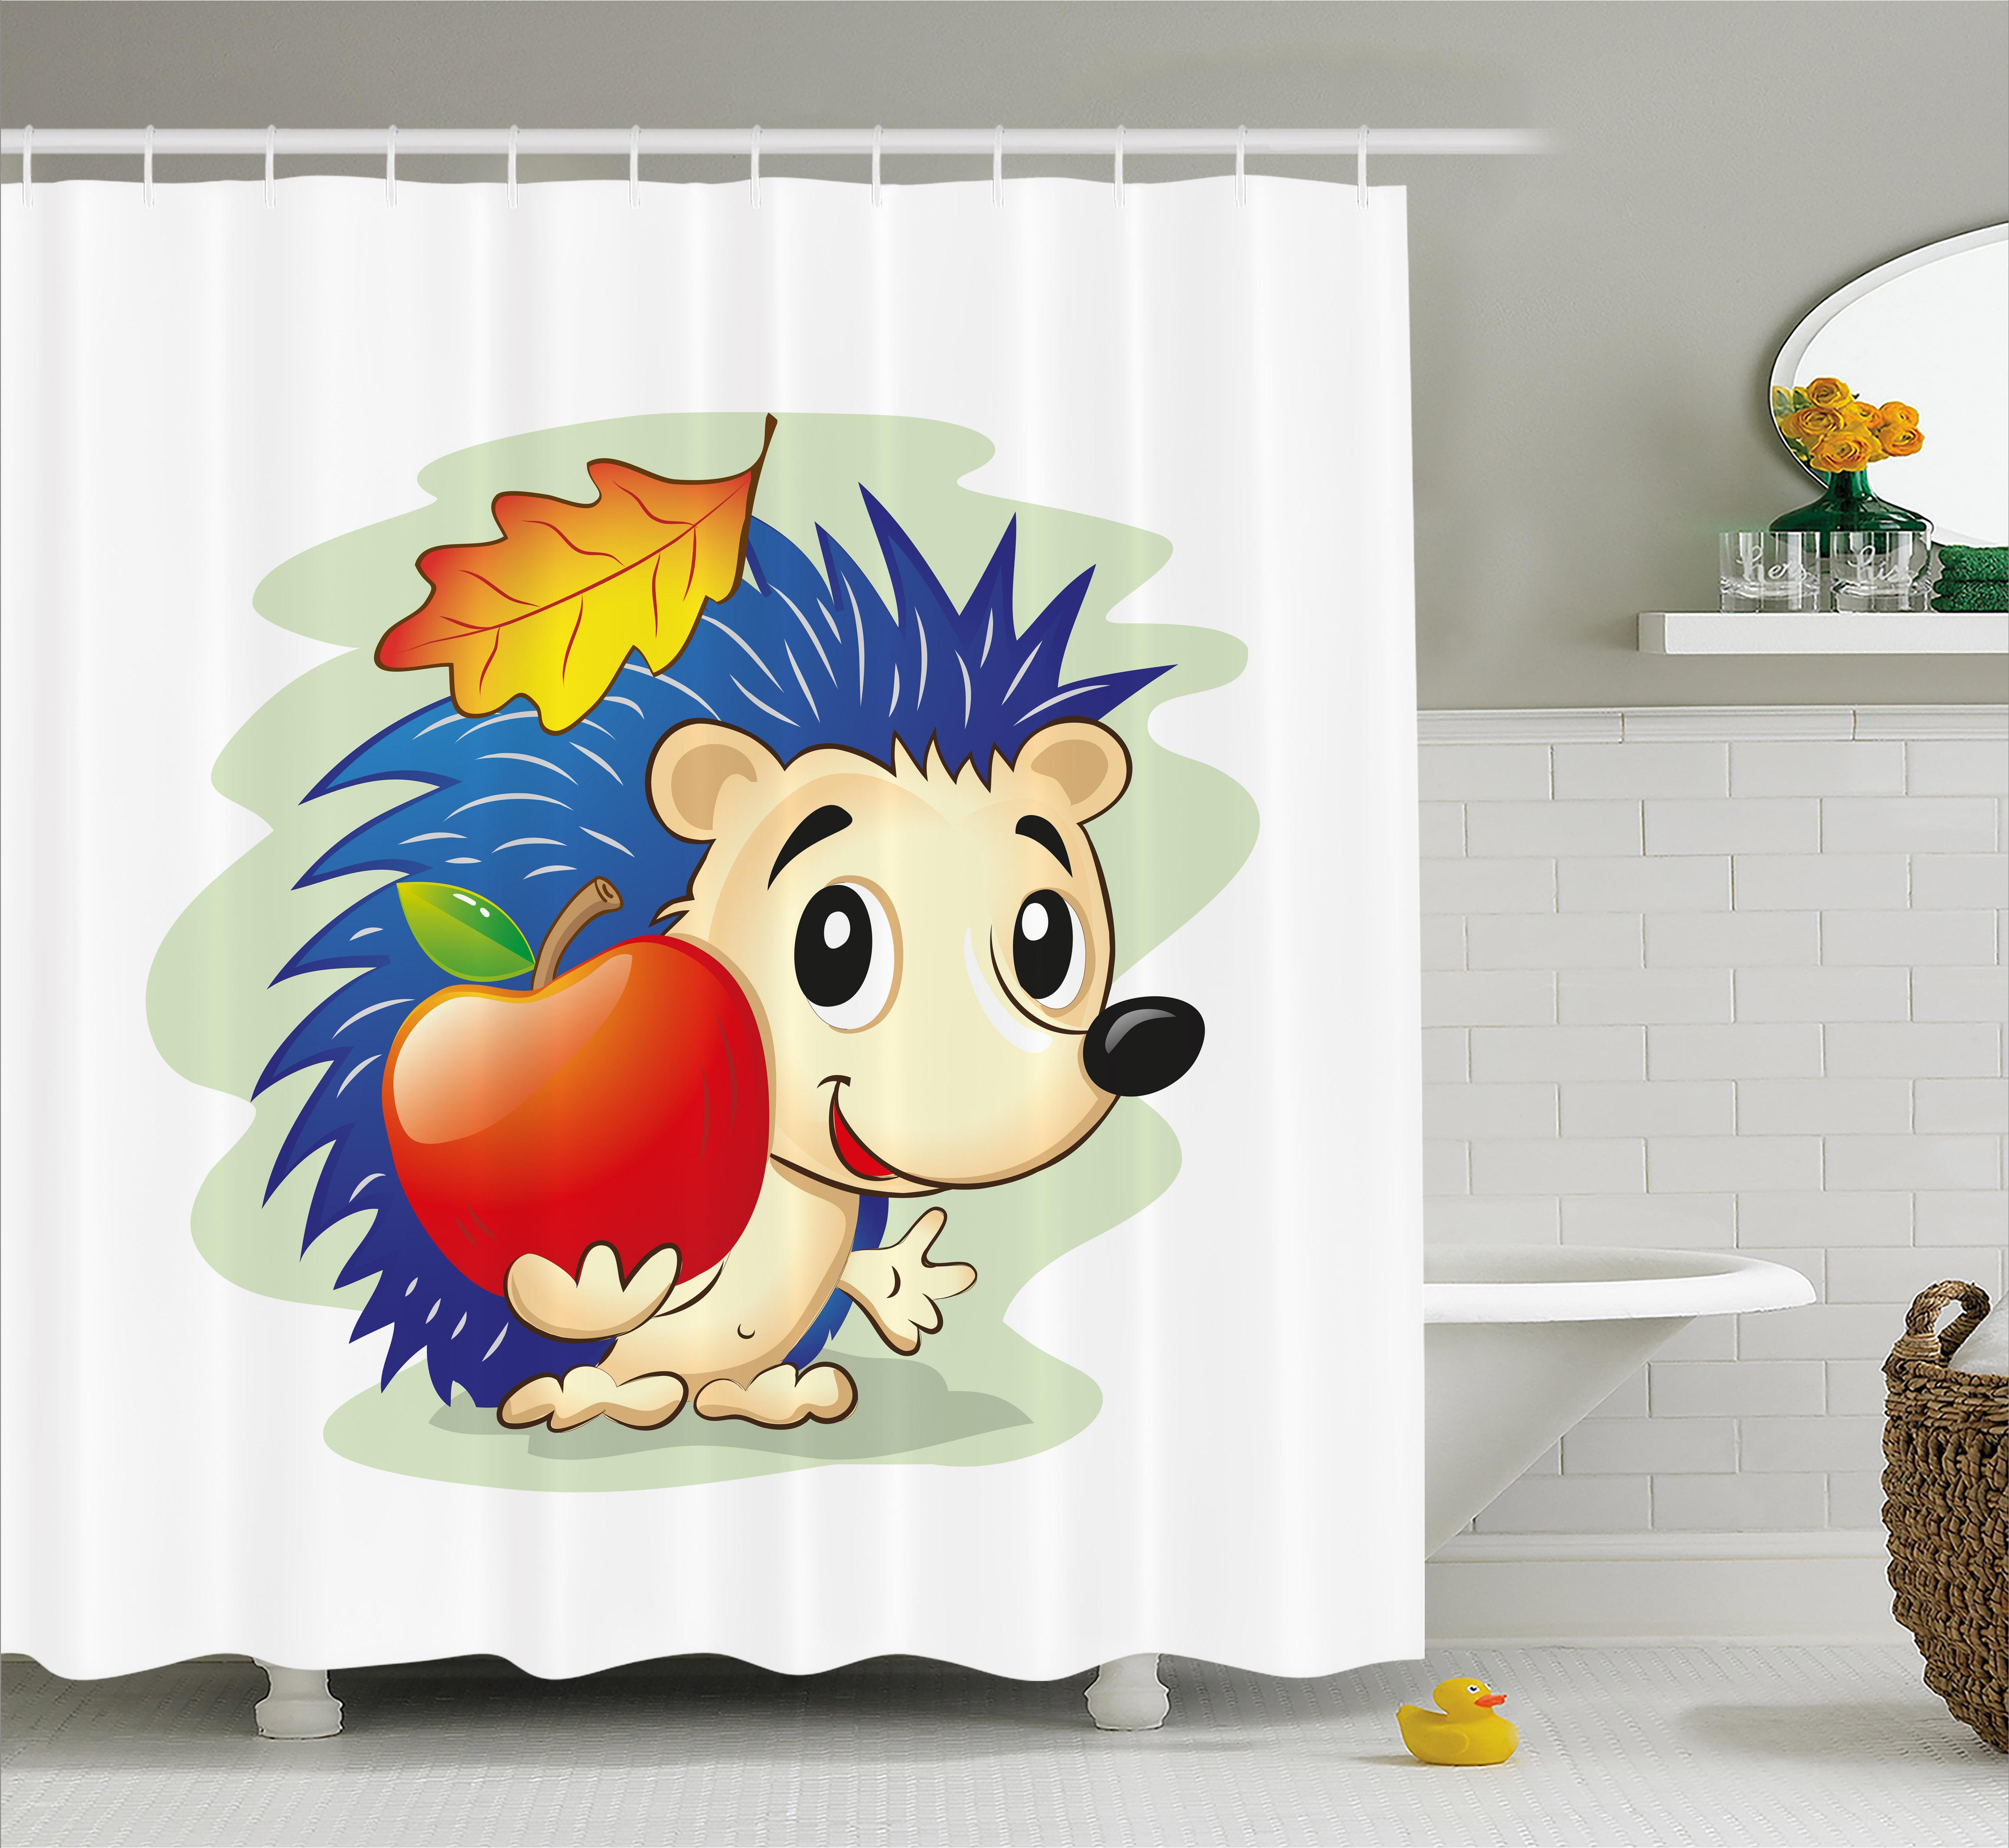 Hedgehog Shower Curtain, Colorful Digital Art Cartoon Ani...